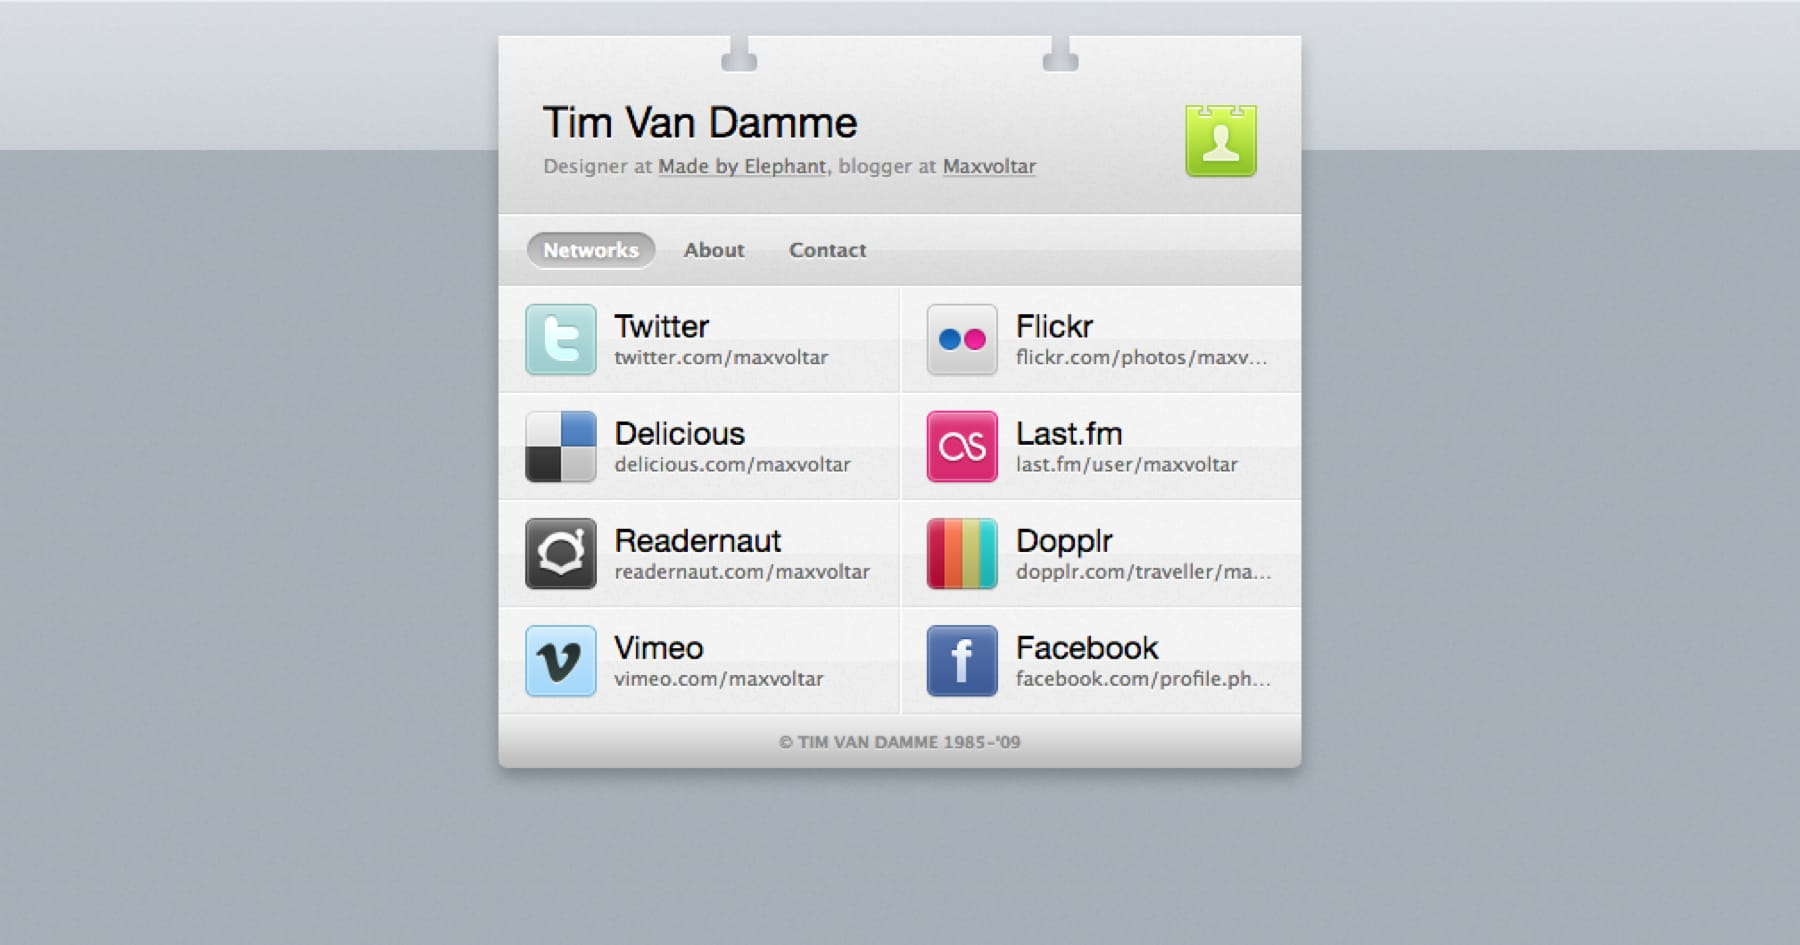 Tim Van Damme vCard website